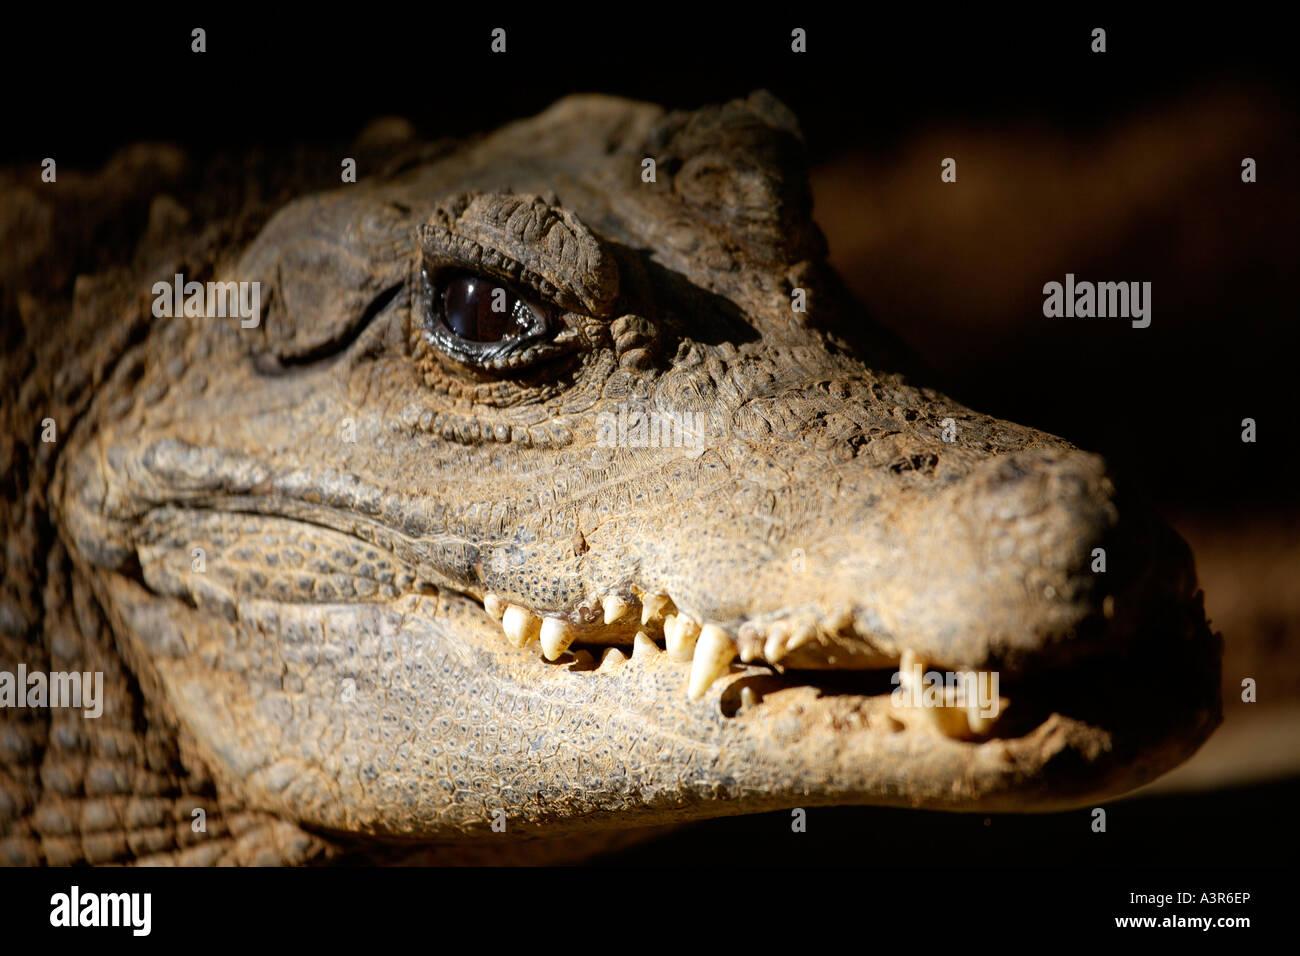 West African Dwarf Crocodile (Osteolaemus tetraspis tetraspis) Stock Photo